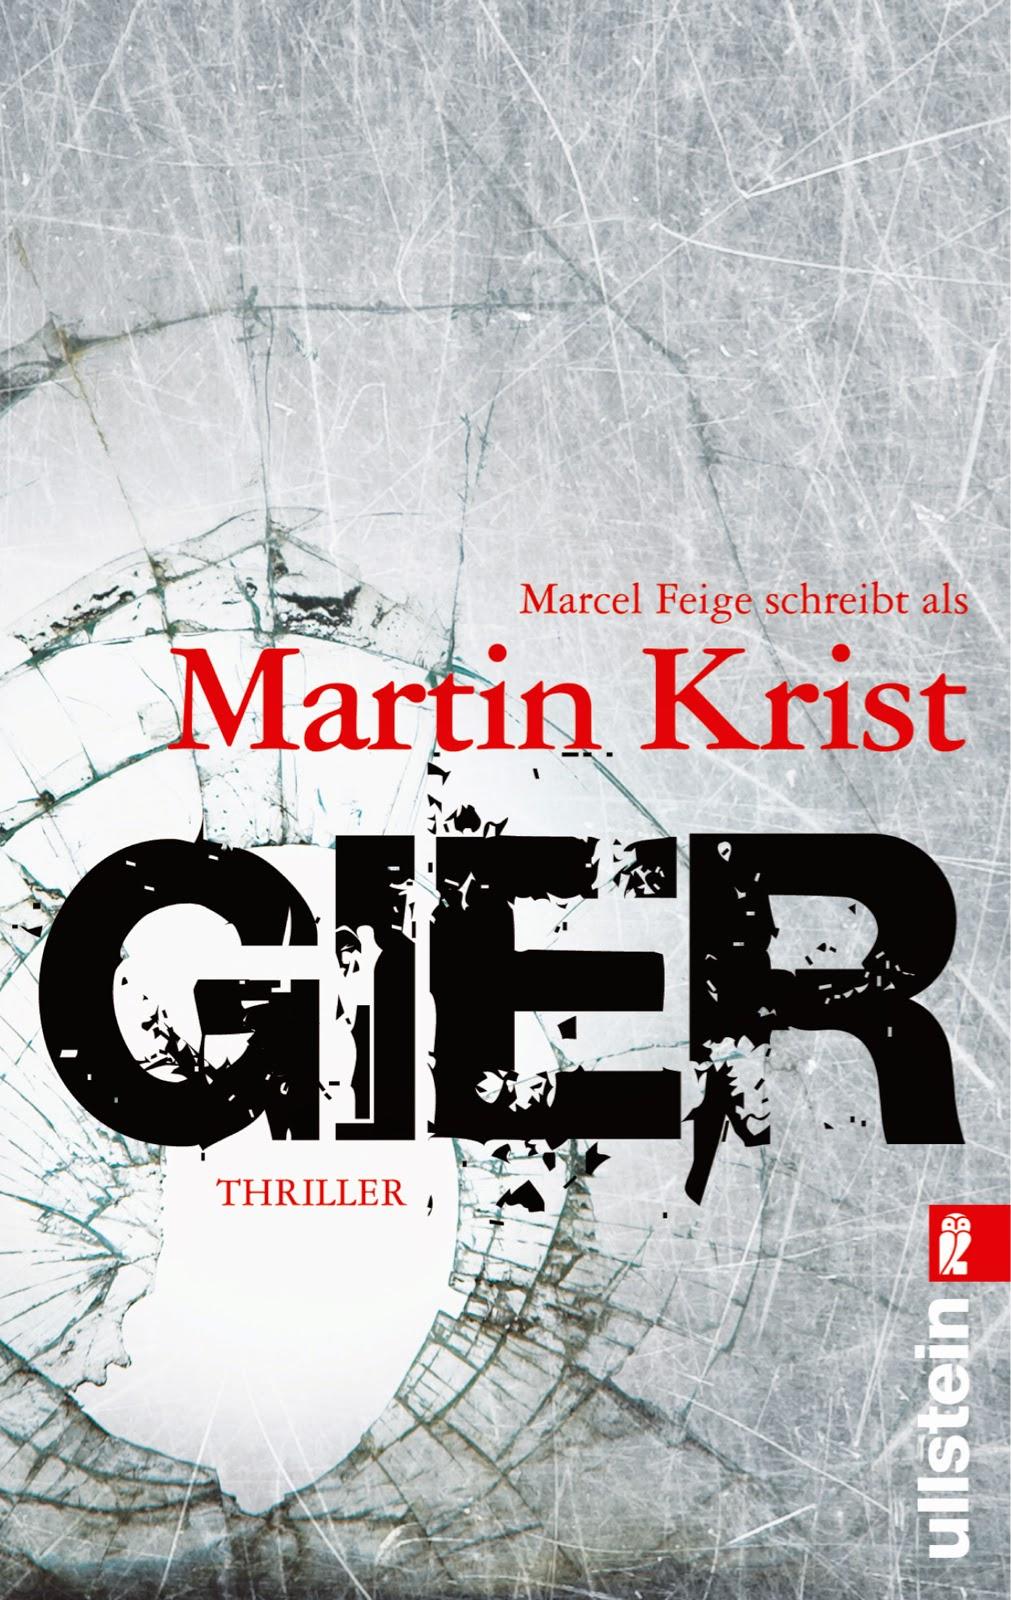 http://www.amazon.de/Gier-Ein-Paul-Kalkbrenner-Thriller-Martin-Krist-ebook/dp/B00BZ0OU7S/ref=pd_sim_b_1?ie=UTF8&refRID=151XPBDAP4R01GRHRHHG